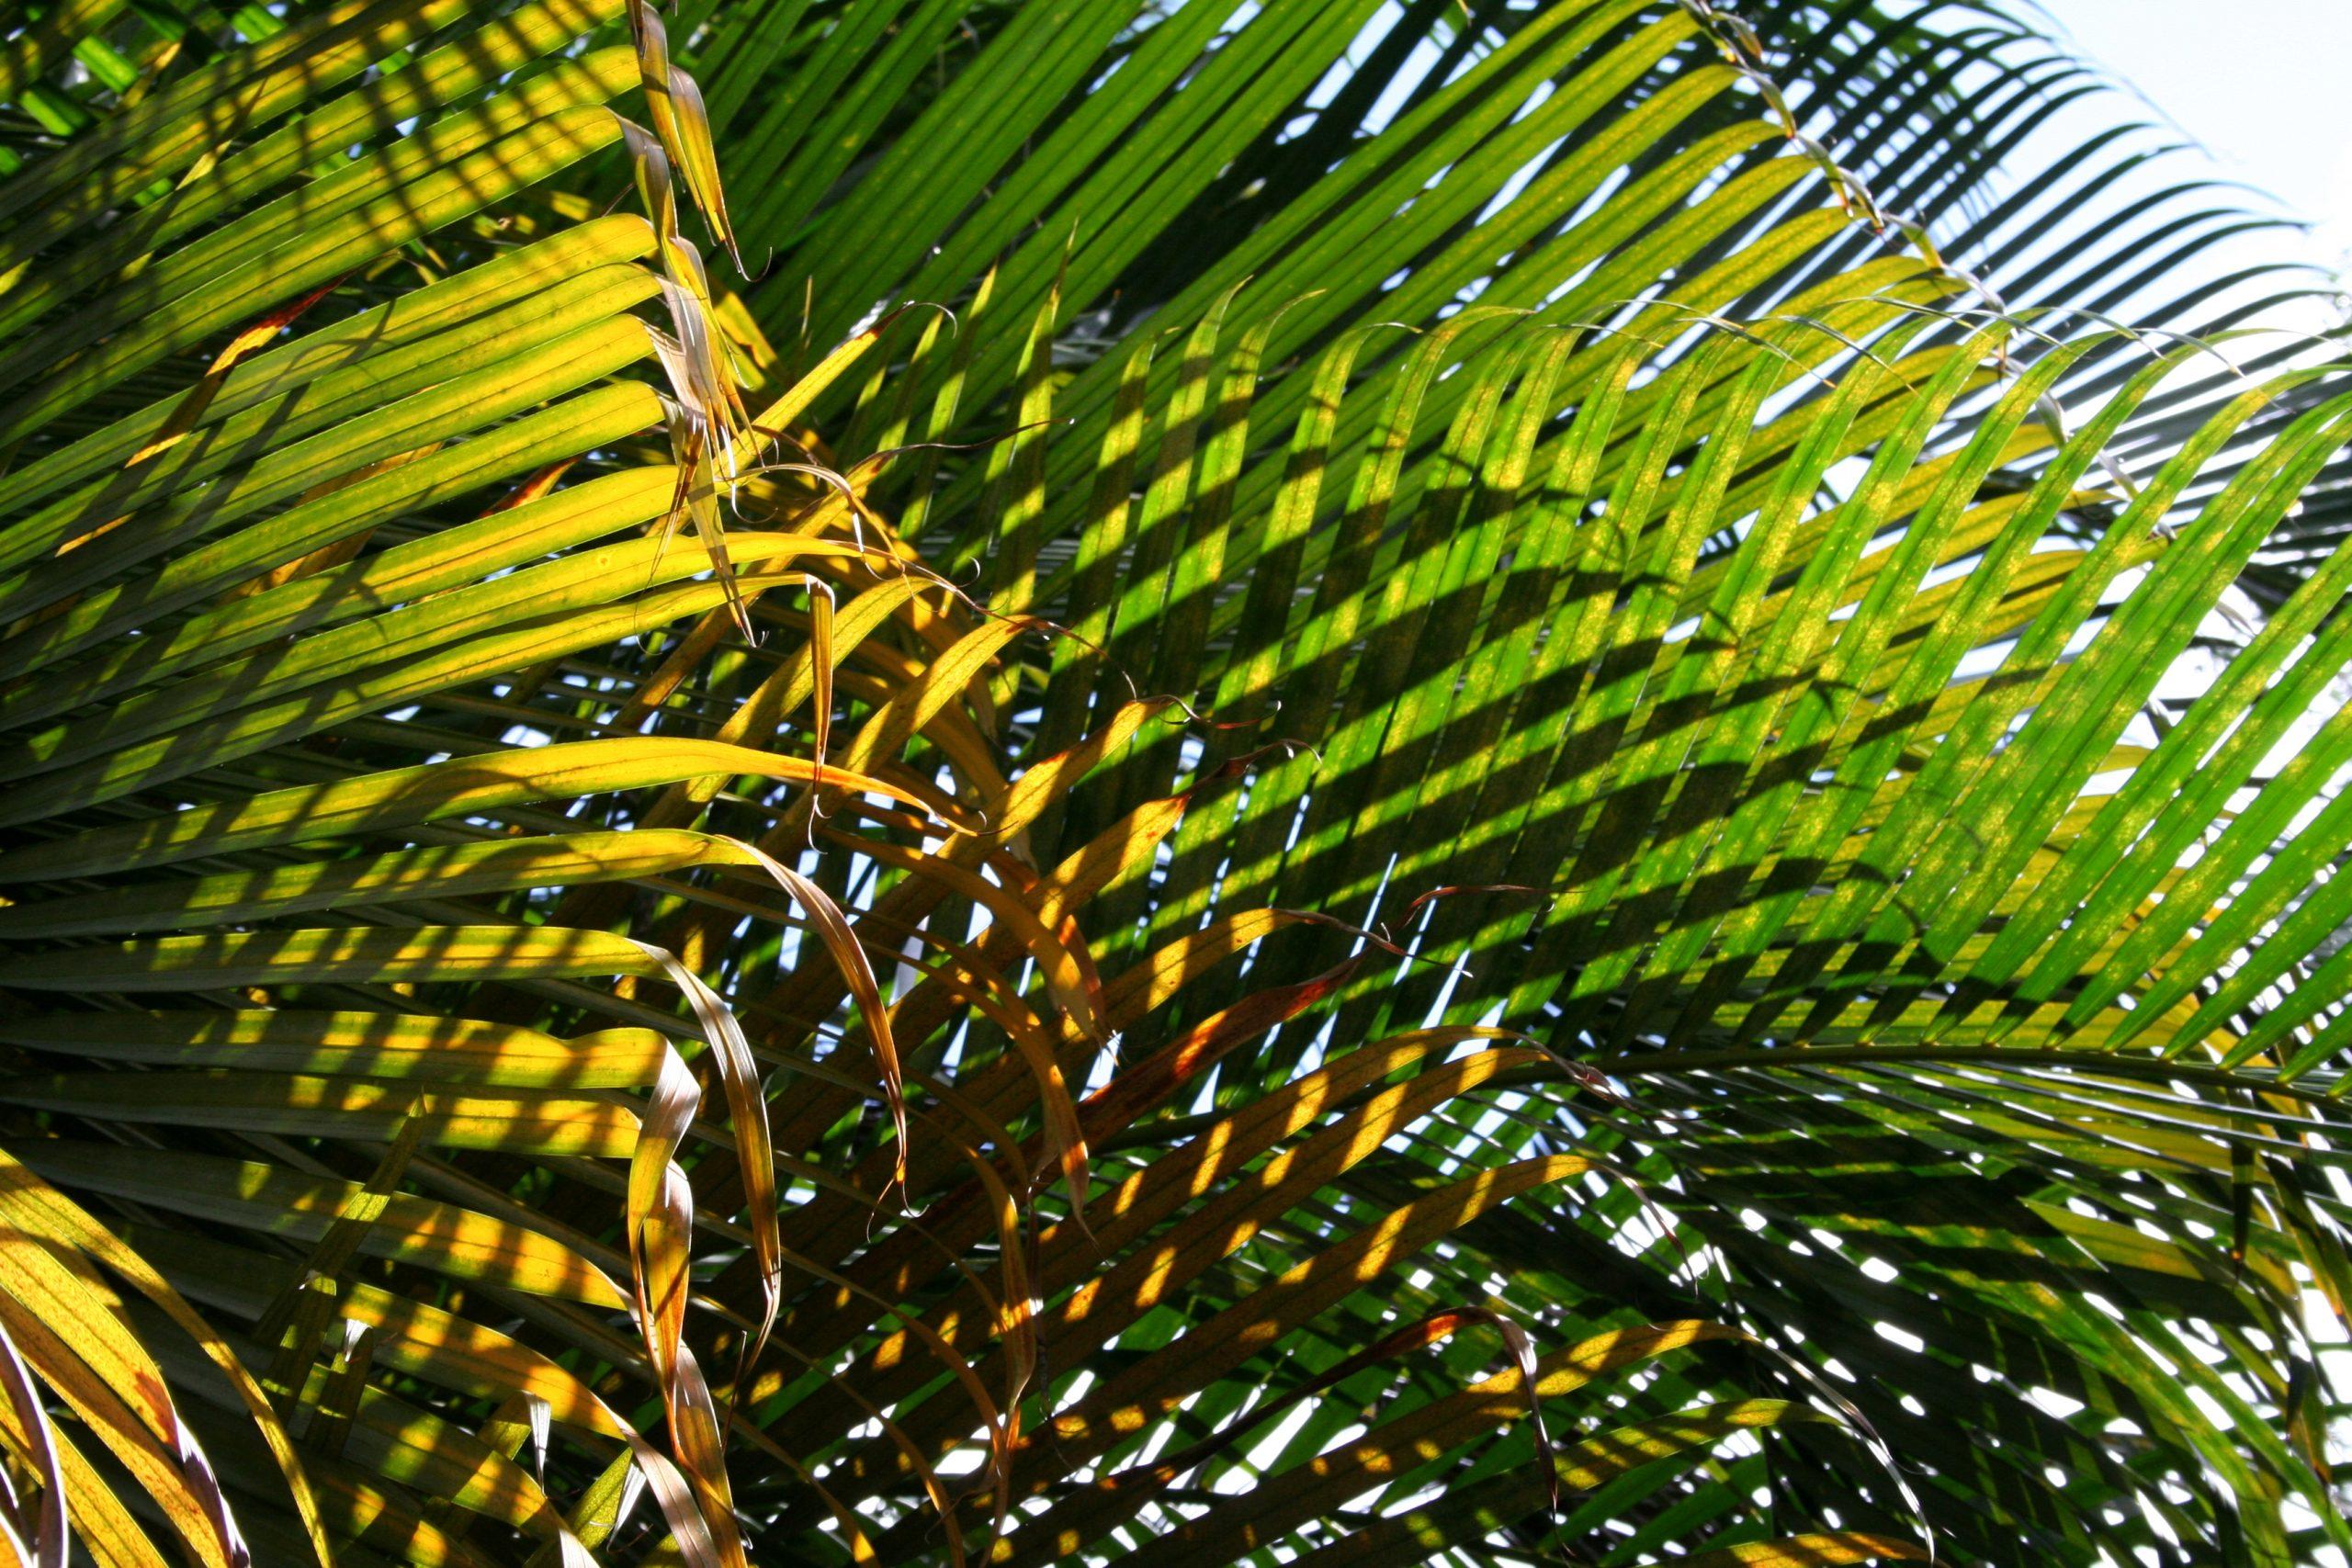 2008, Honolulu, Hawaii